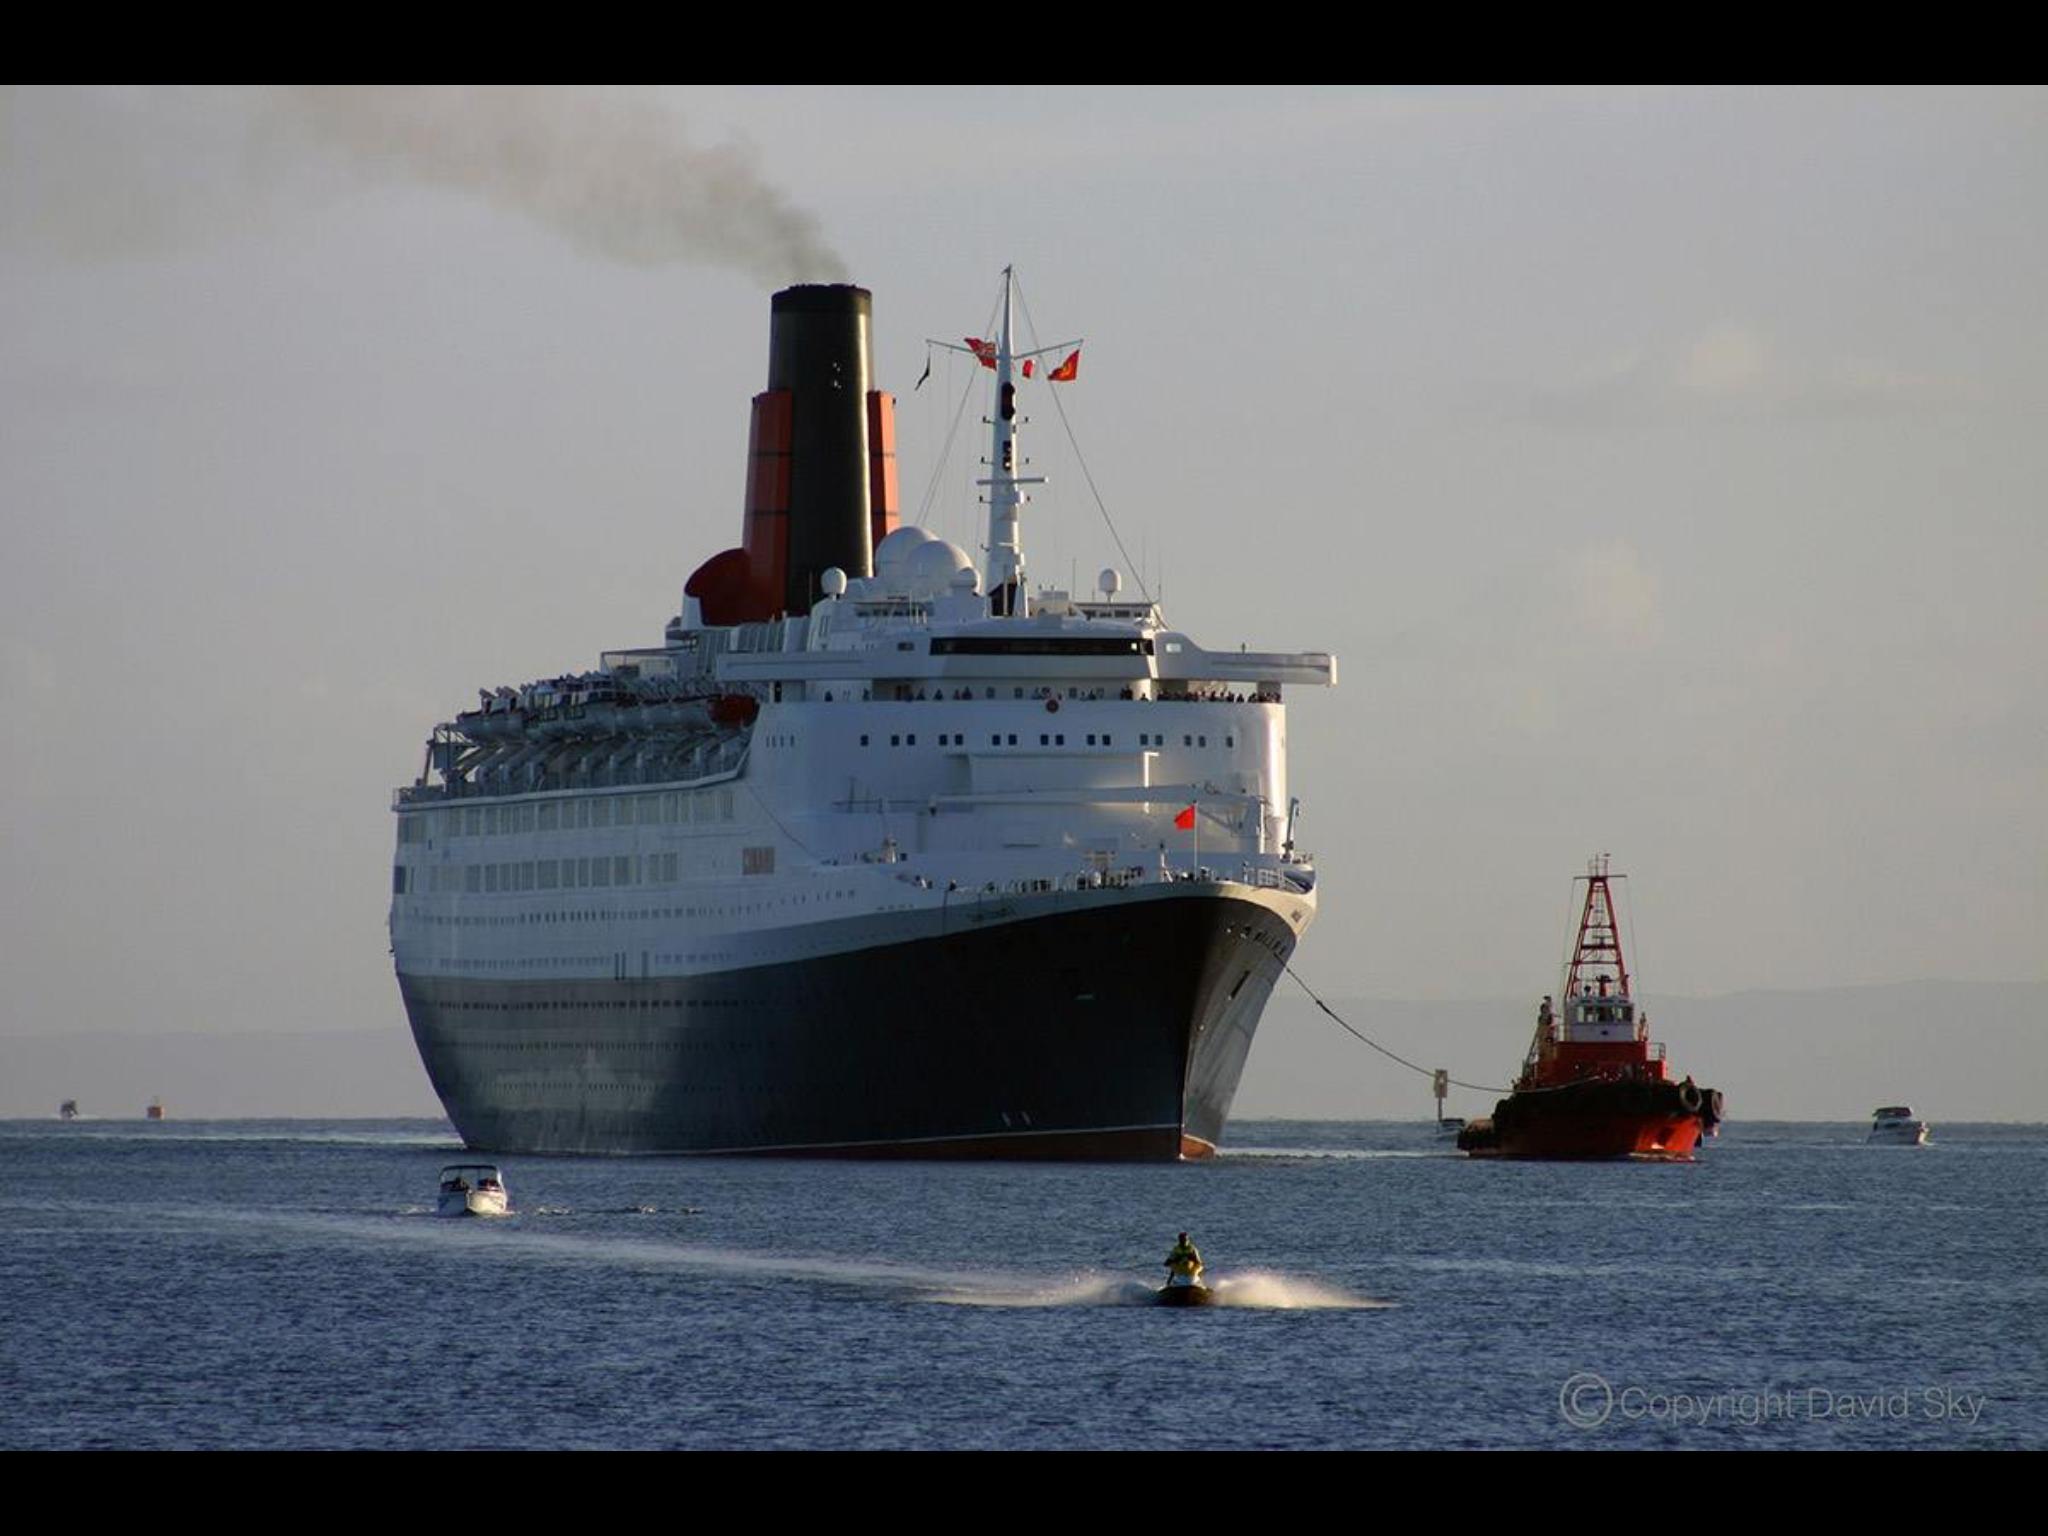 Pin By Oceanic House On Cunard Qe2 Cunard Cruise Cruise Liner Cruise